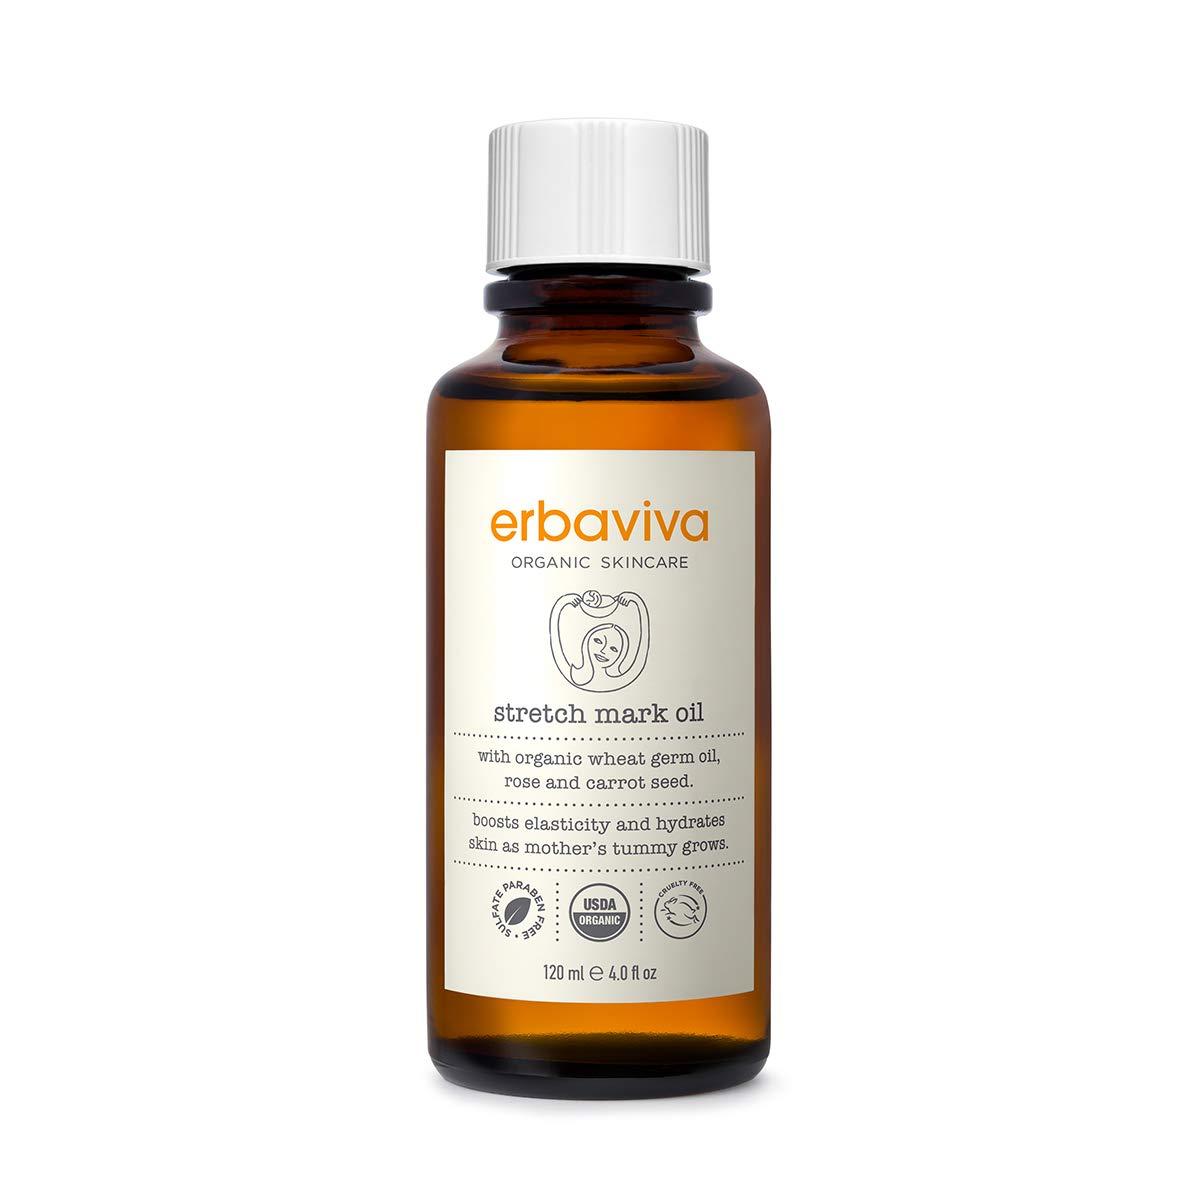 Erbaviva Stretch Mark Oil, 4 oz by erbaviva